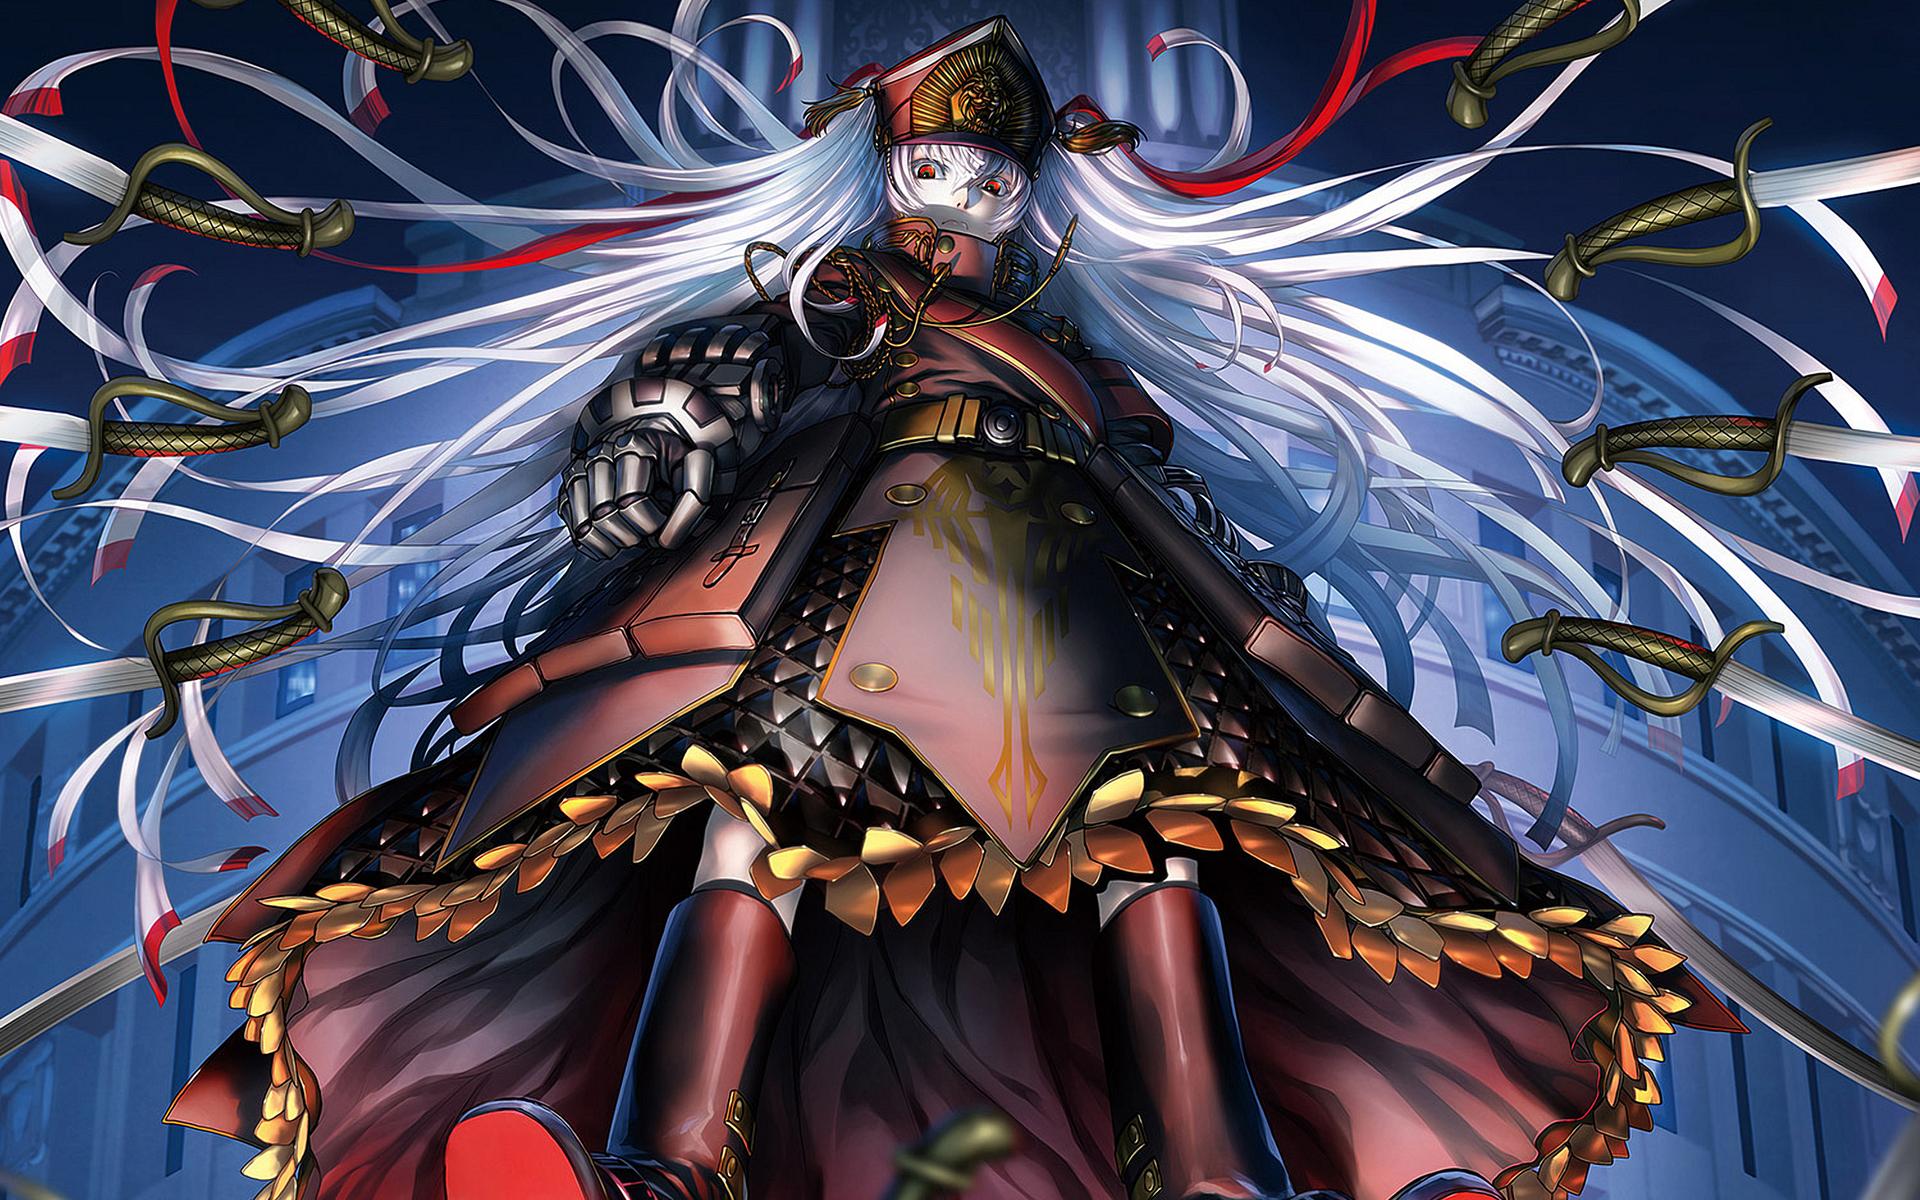 Re creators hd wallpaper background image 1920x1200 - Fondos de pantalla para pc 4k anime ...